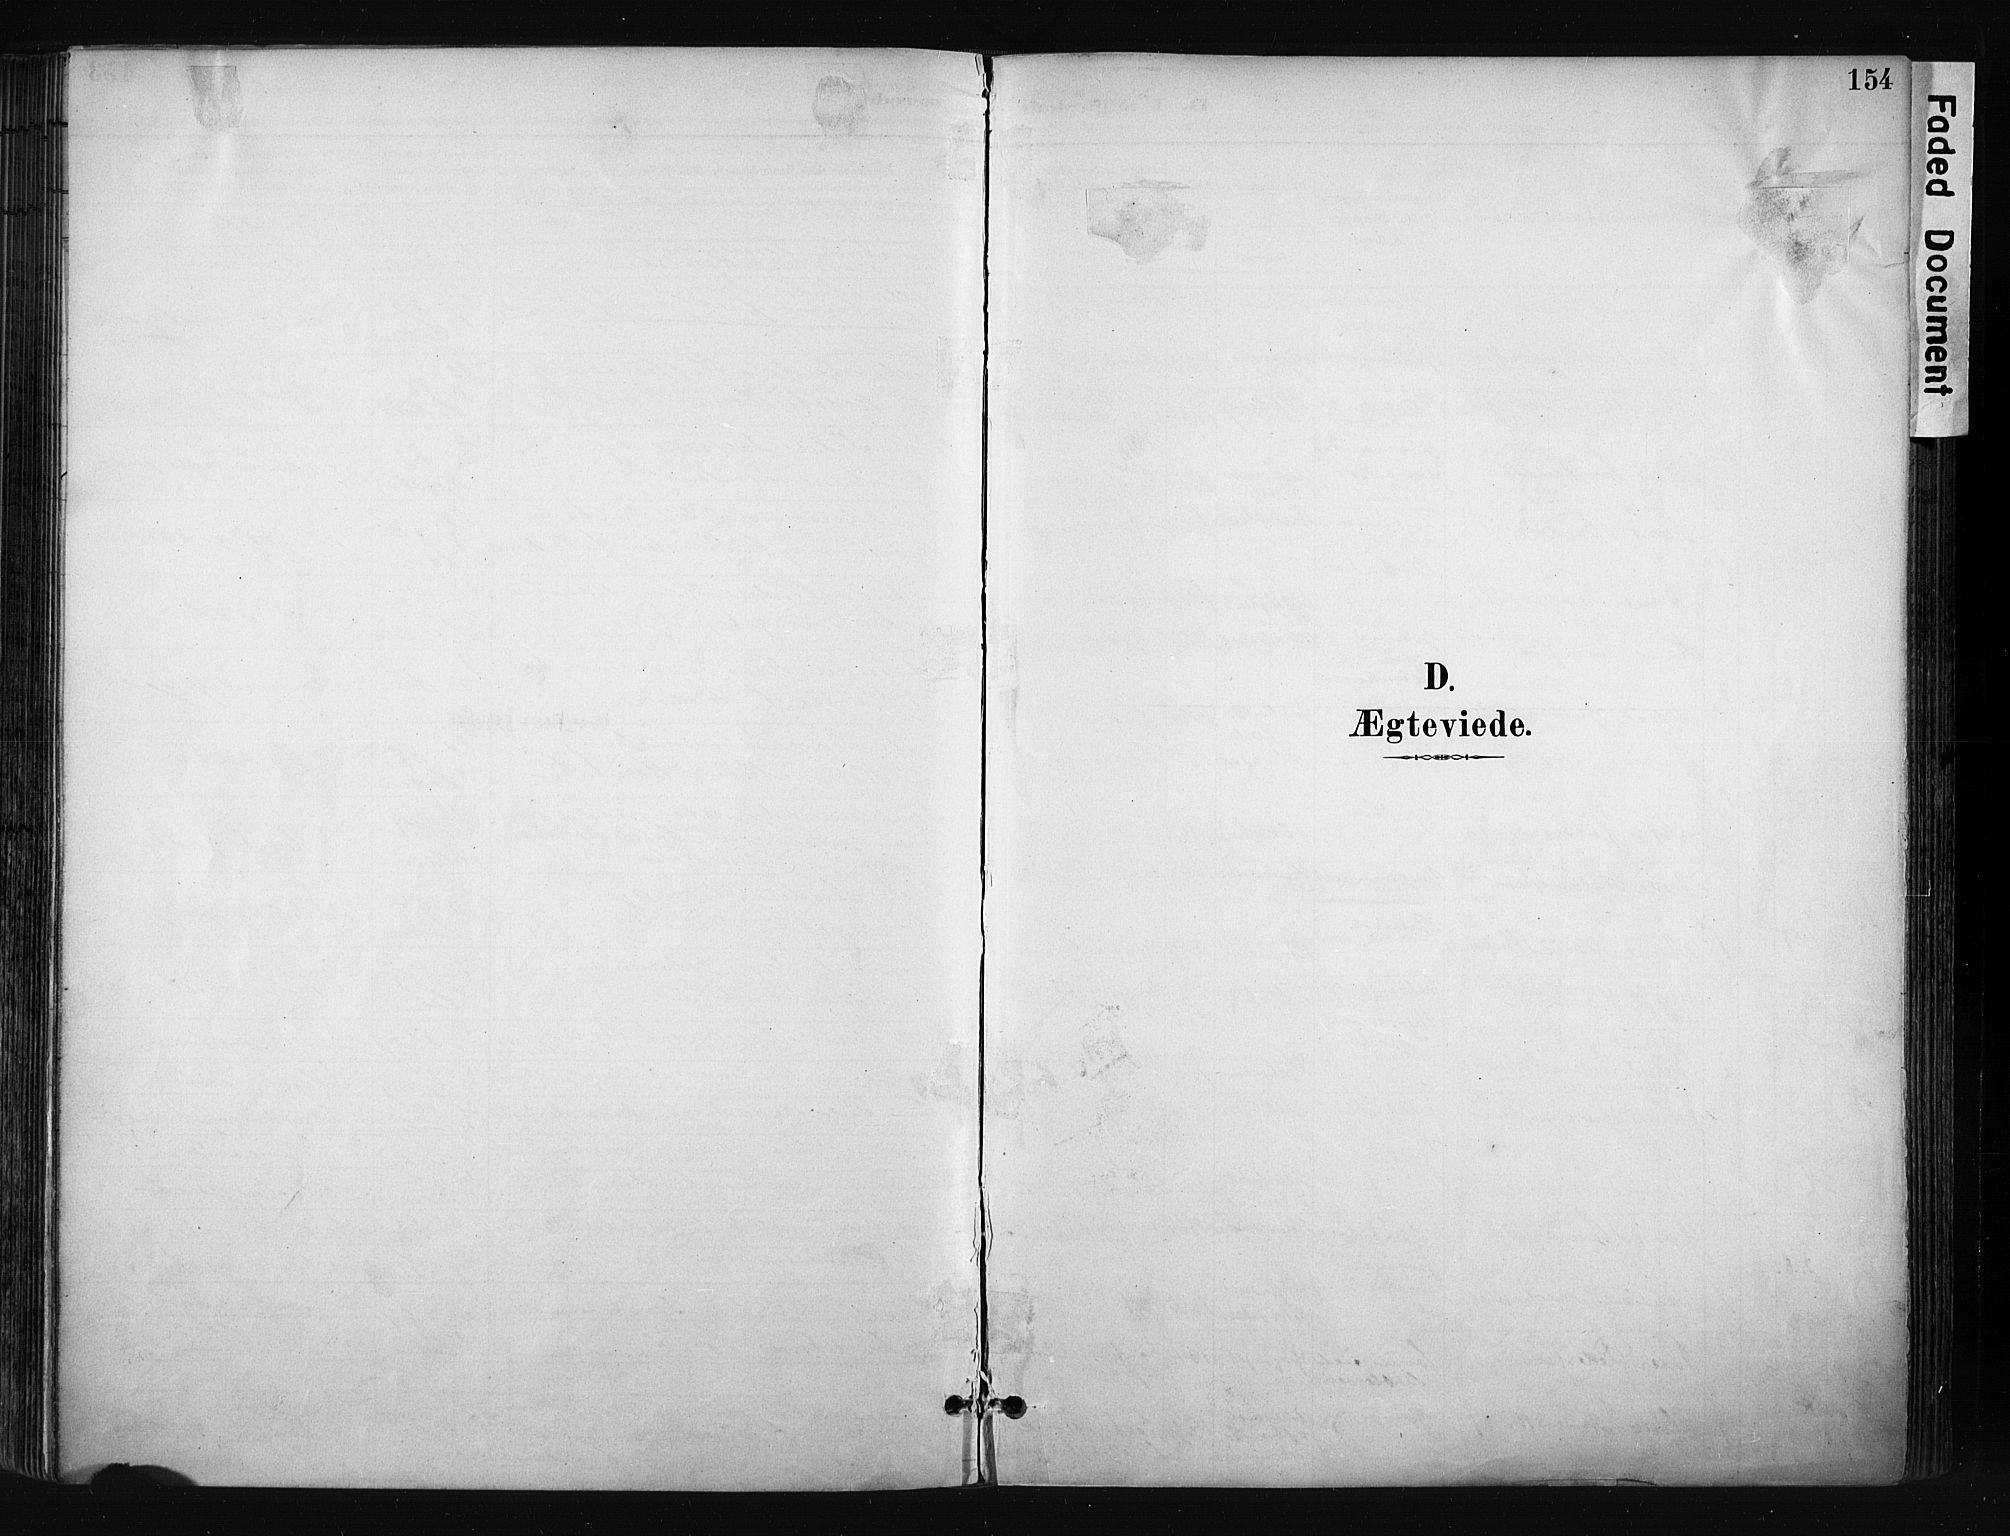 SAH, Gran prestekontor, Ministerialbok nr. 17, 1889-1897, s. 154